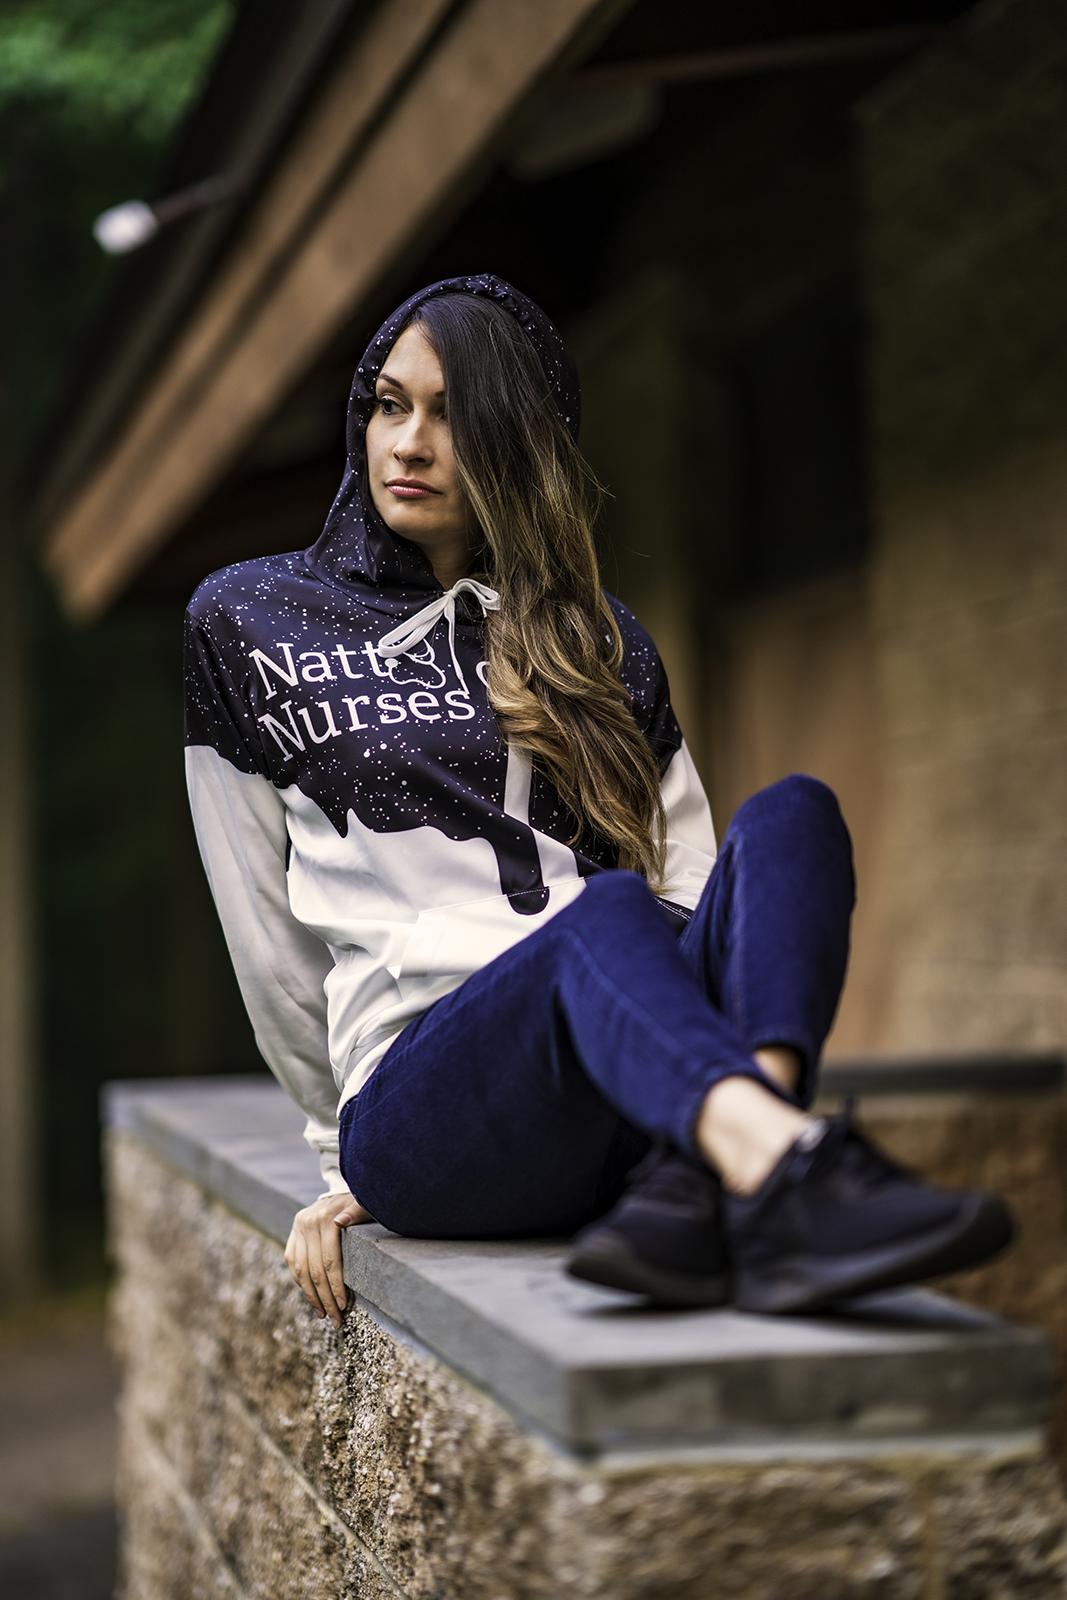 Girl with Natty Nurse hoodie on